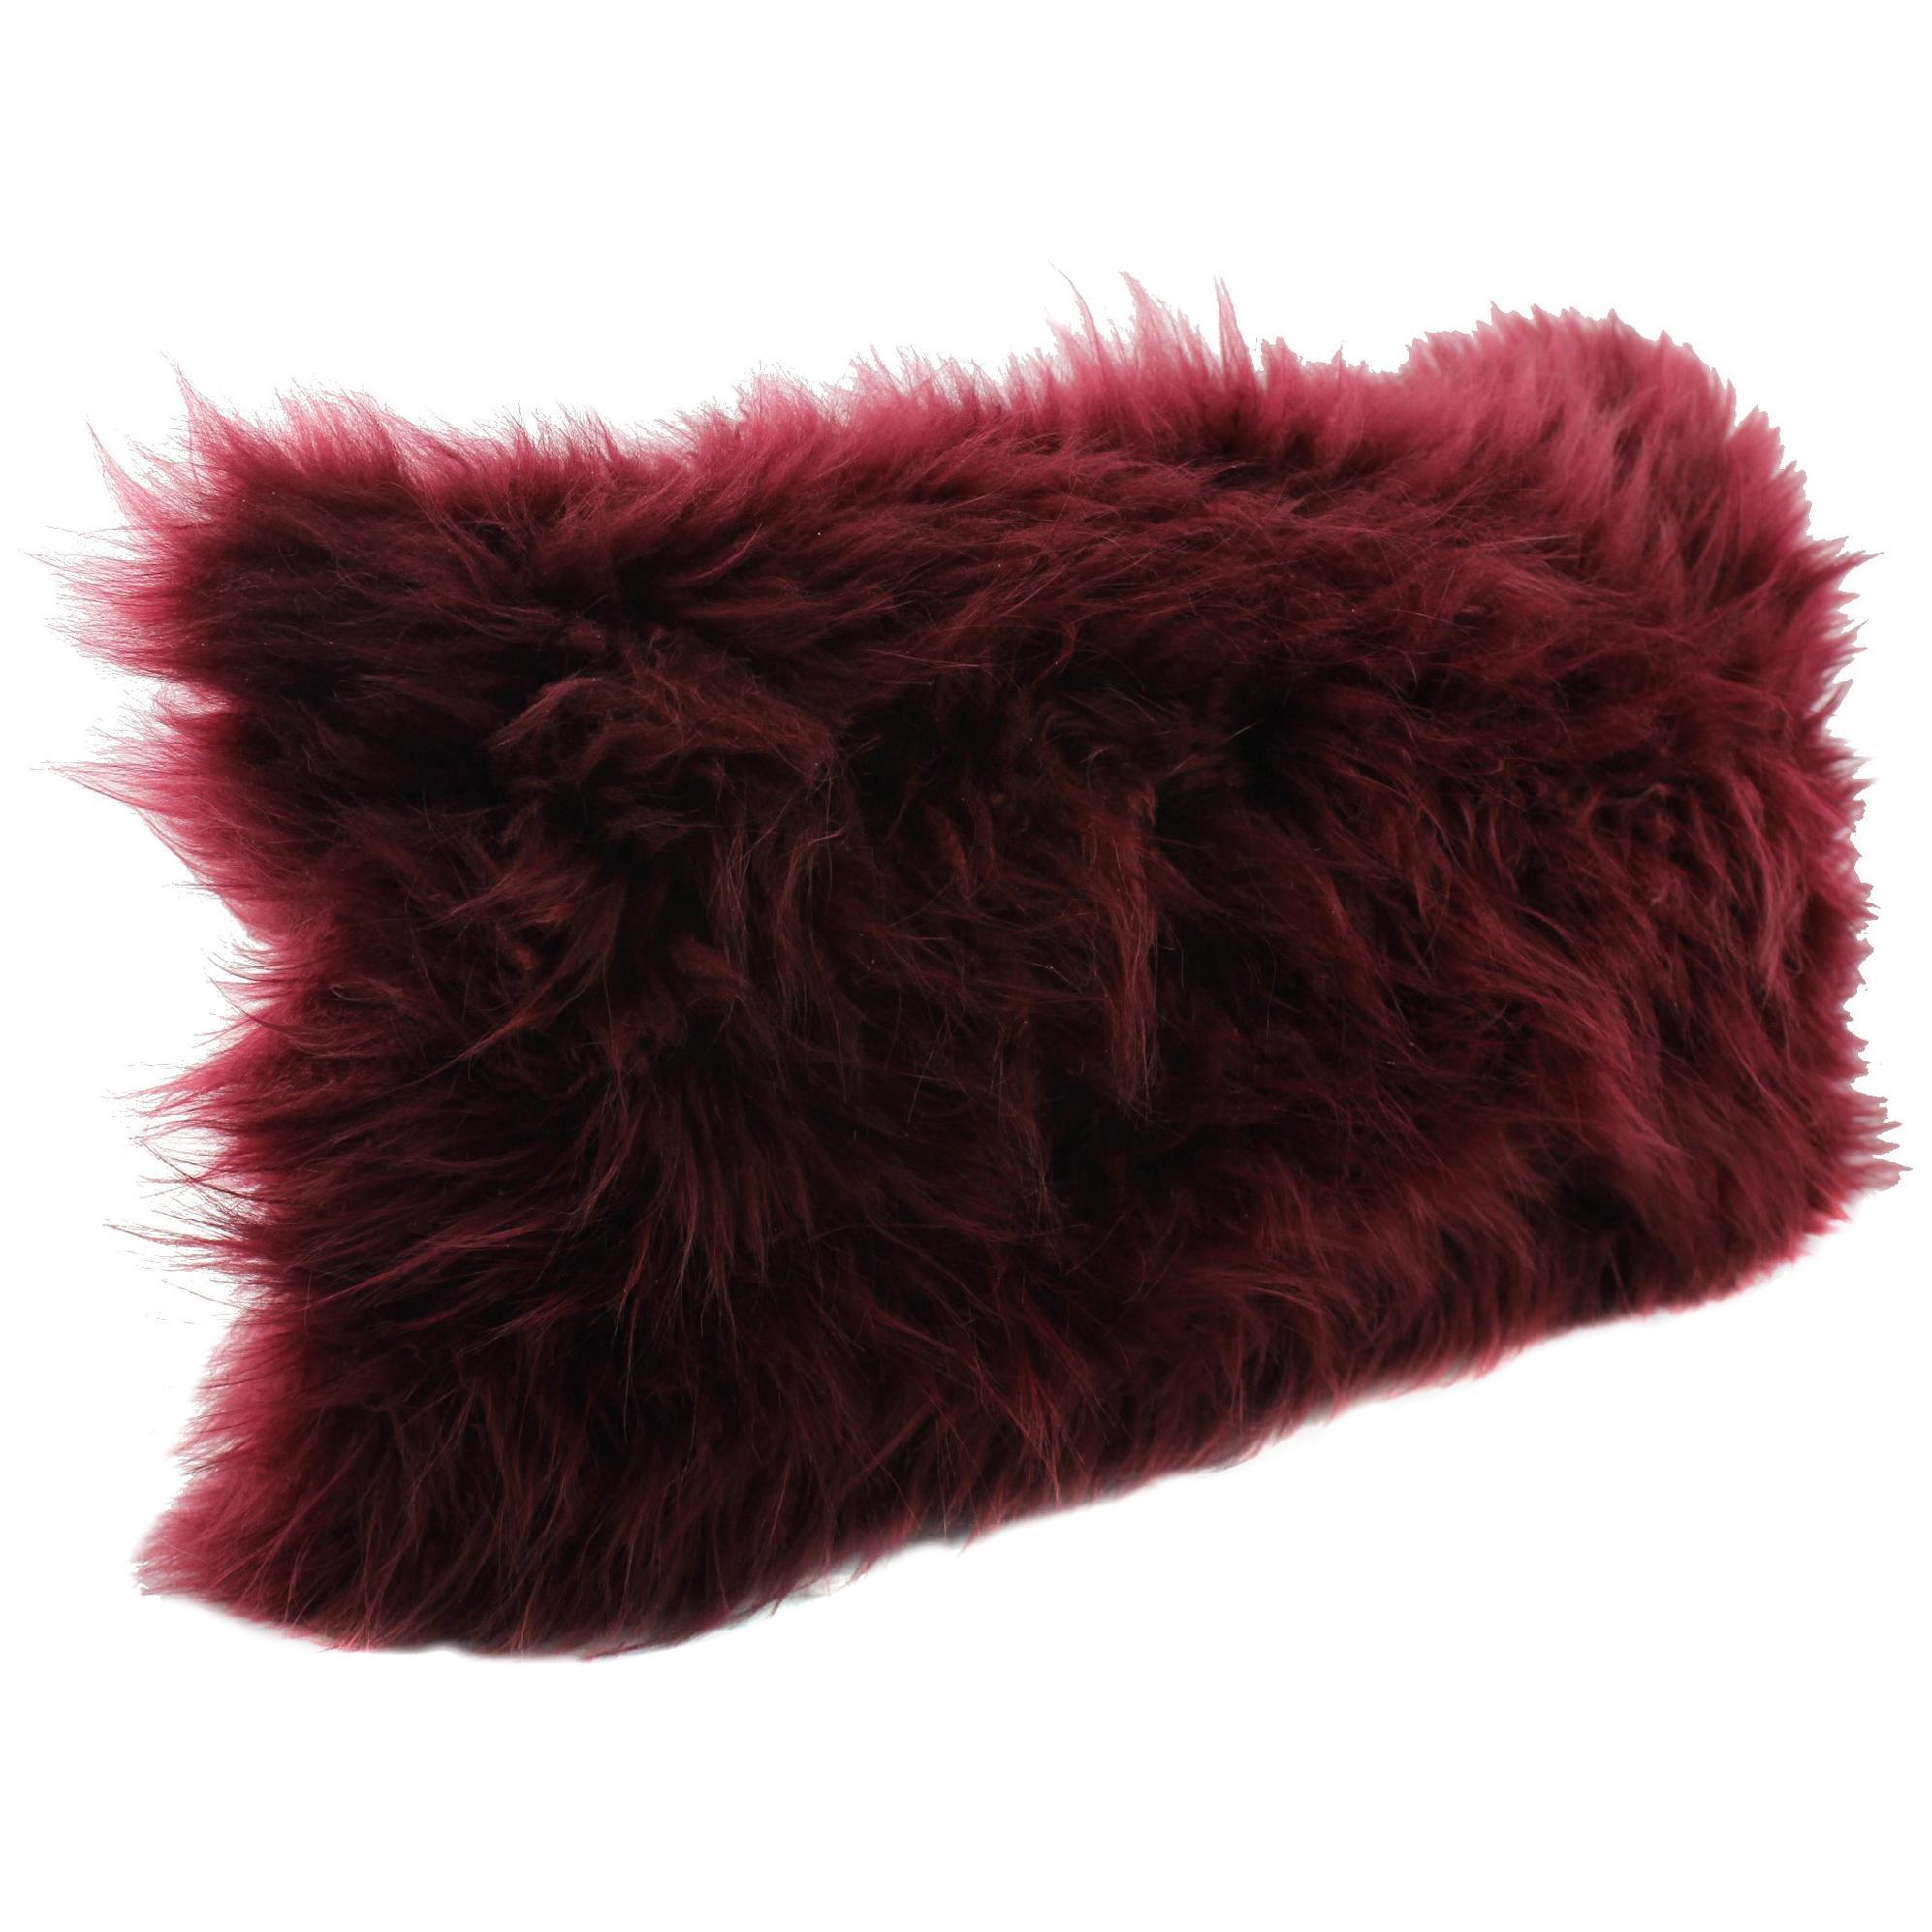 Burgundy Red Cashmere Fur Pillow Cushion